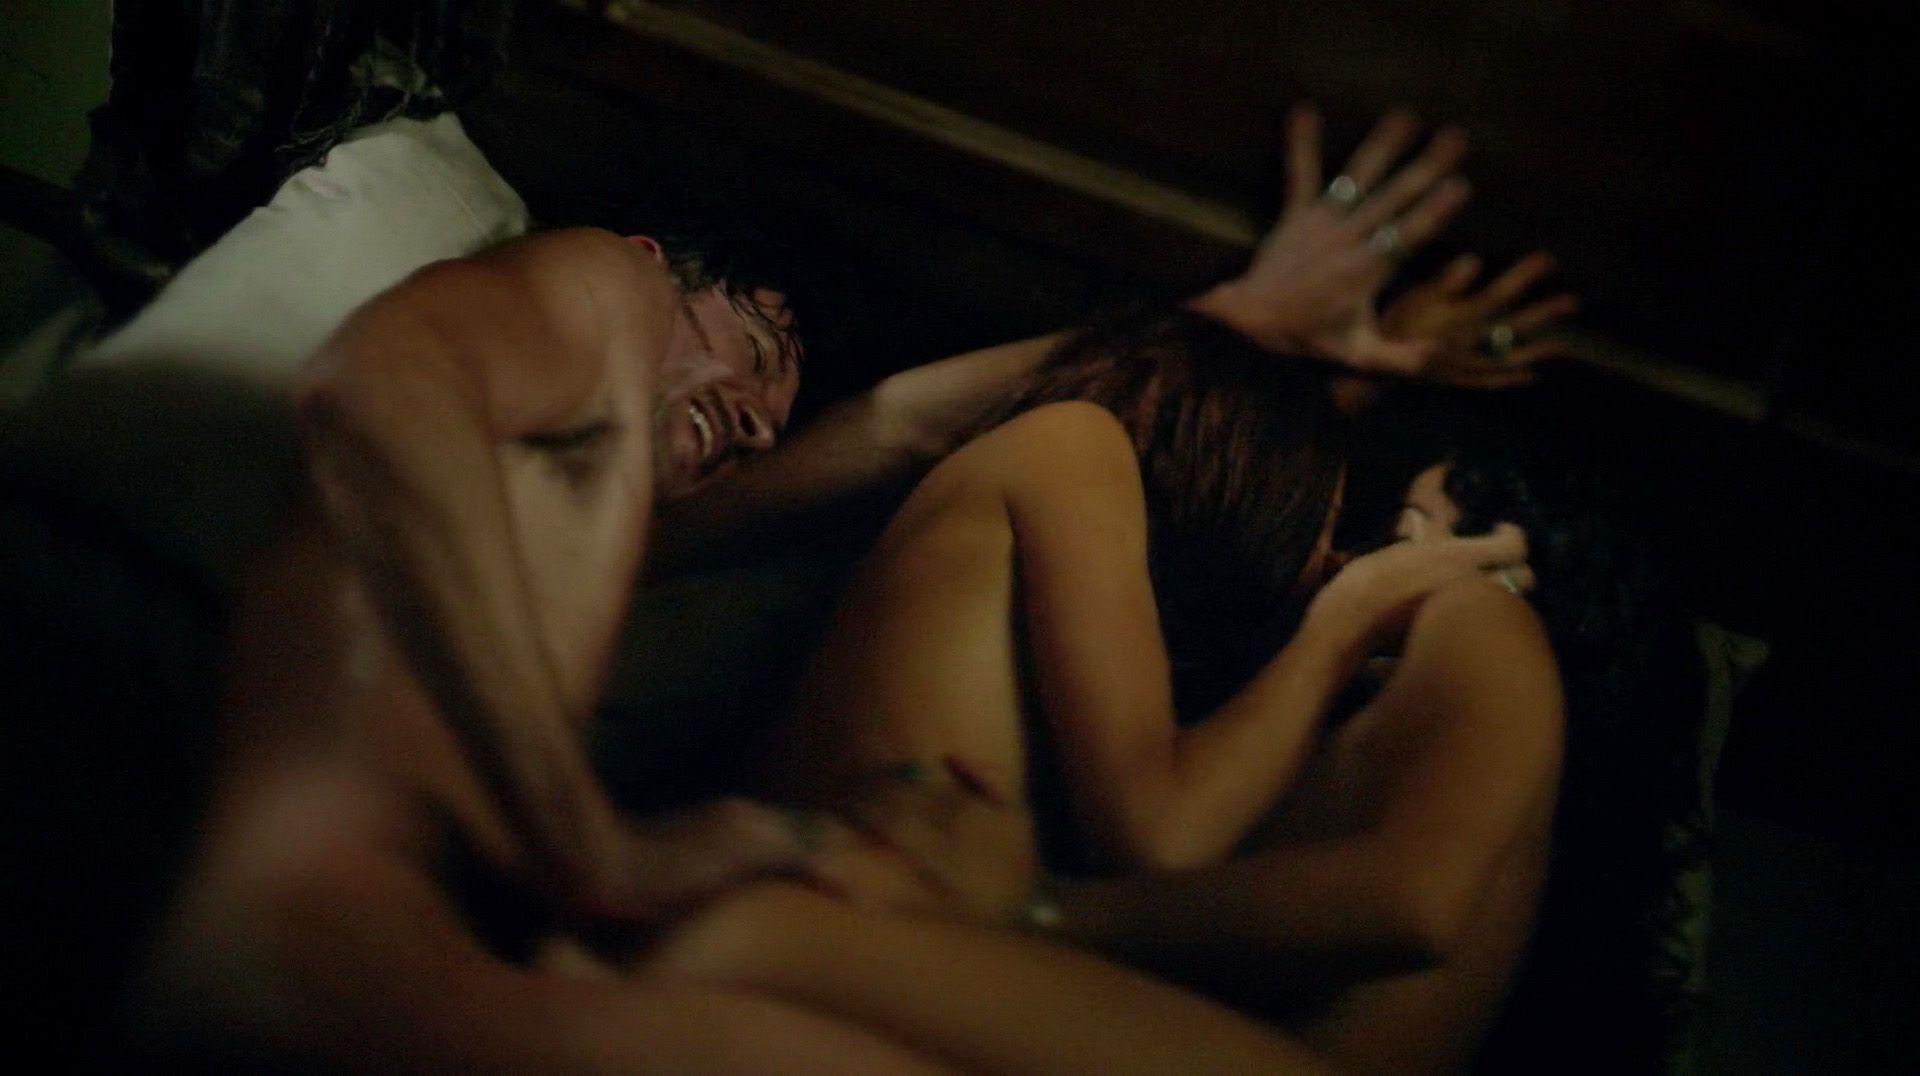 Порно фото сара джесика паркер 22 фотография